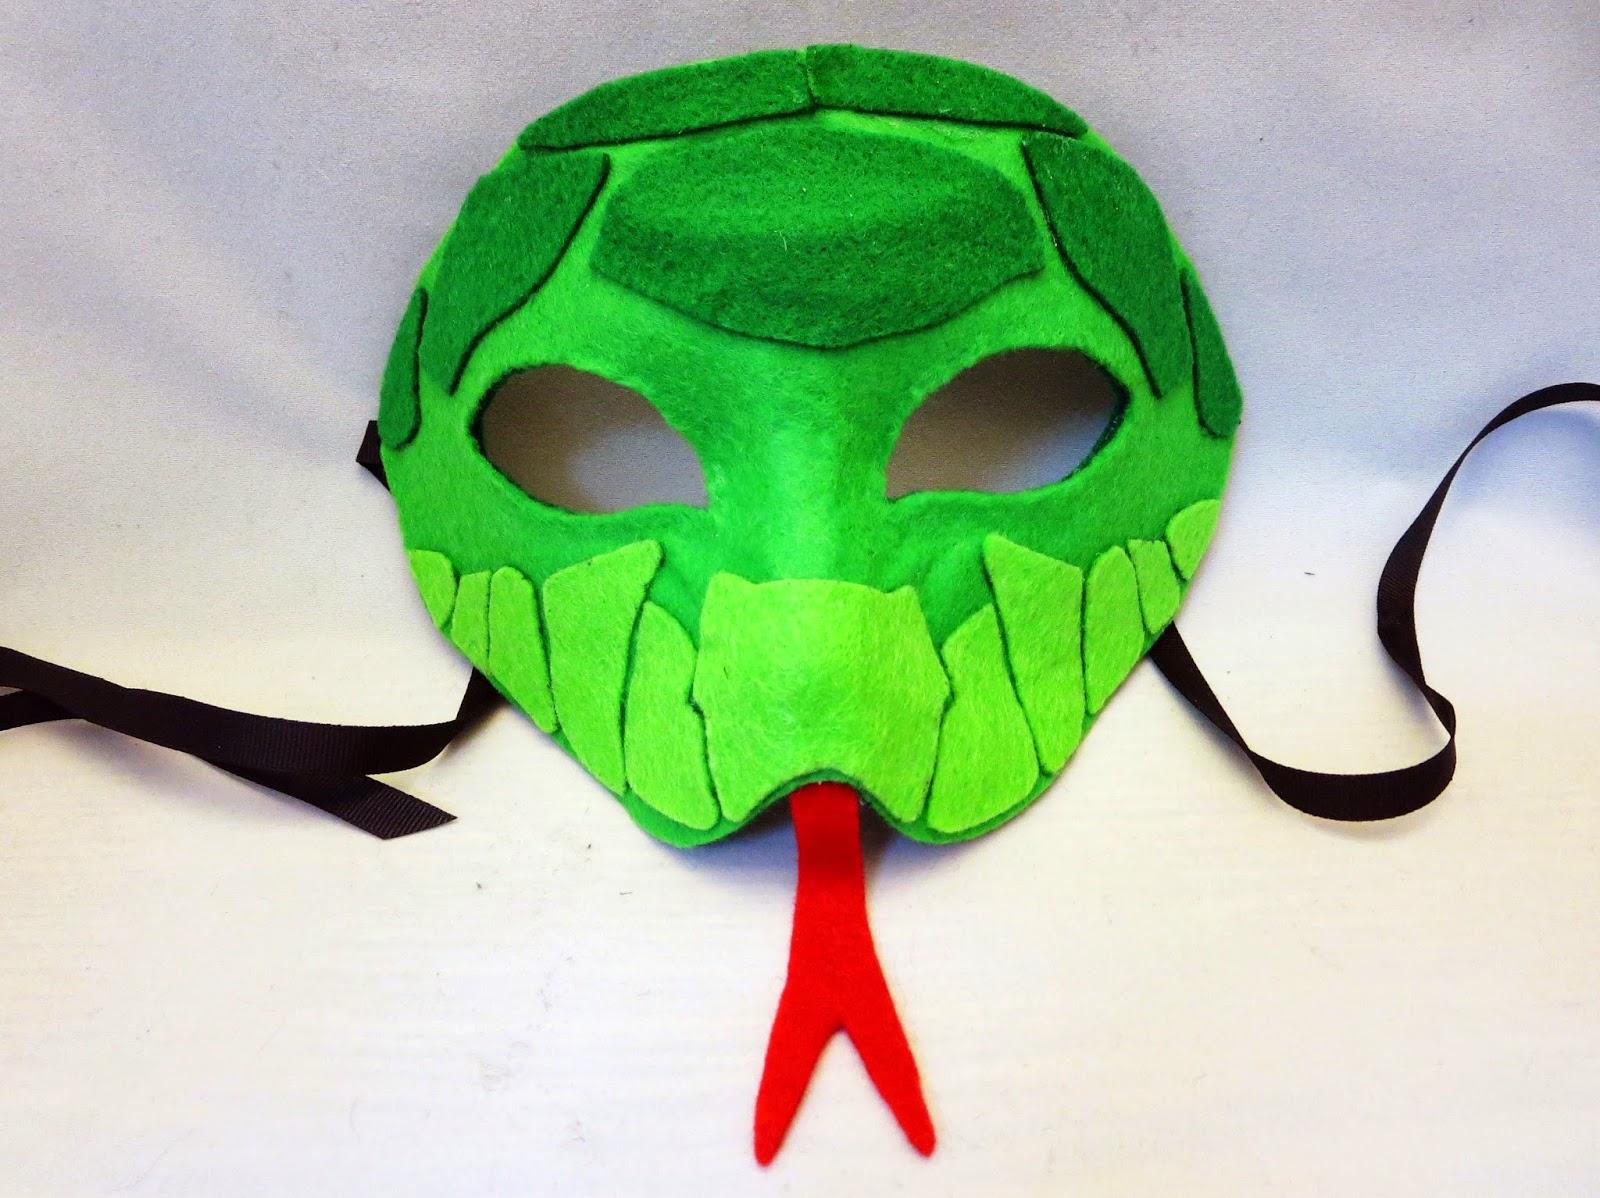 Serpent clipart face mask On 25+ Pinterest Jungle ideas